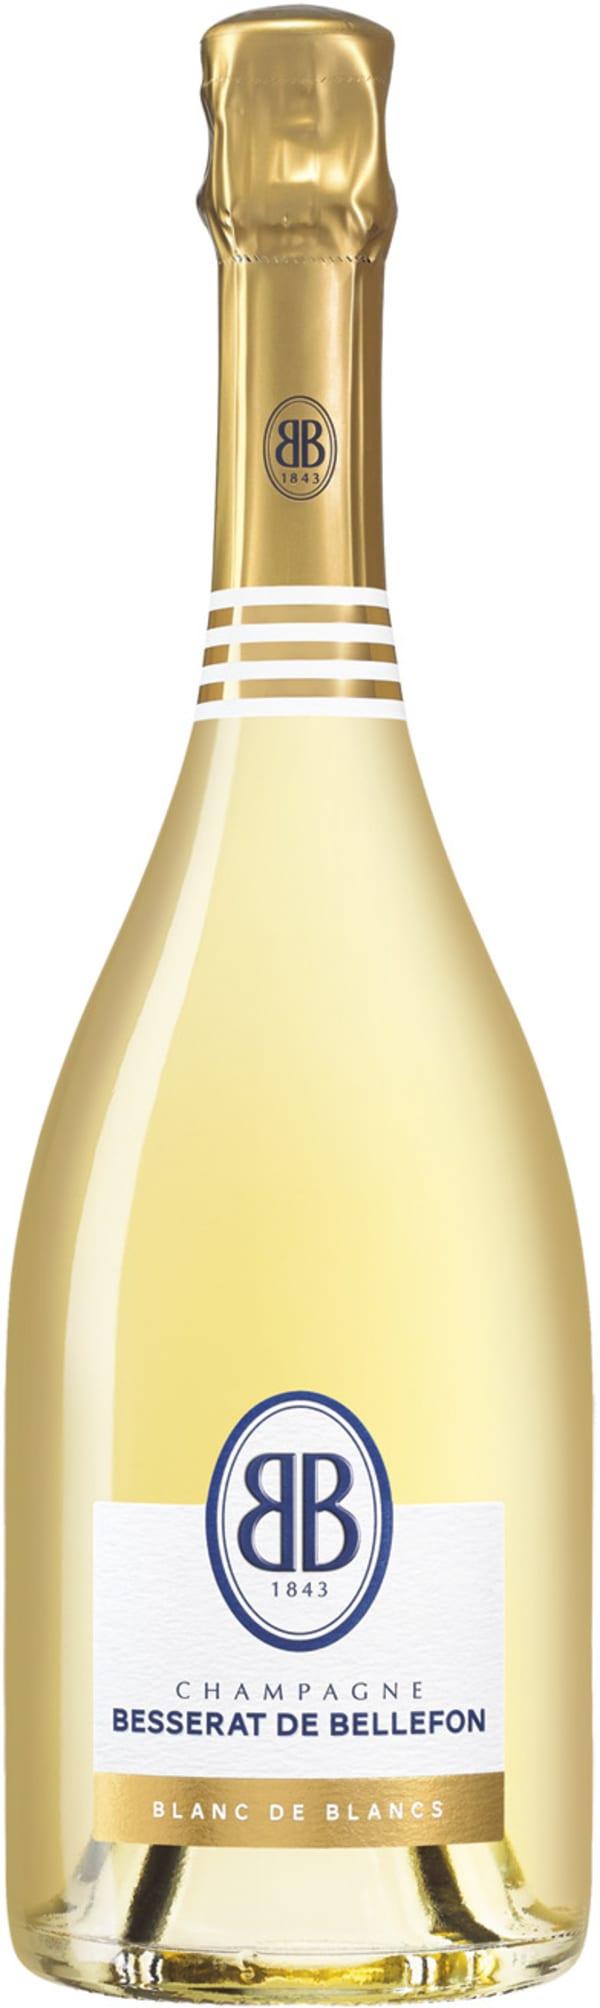 Besserat de Bellefon Blanc de Blancs Champagne Brut